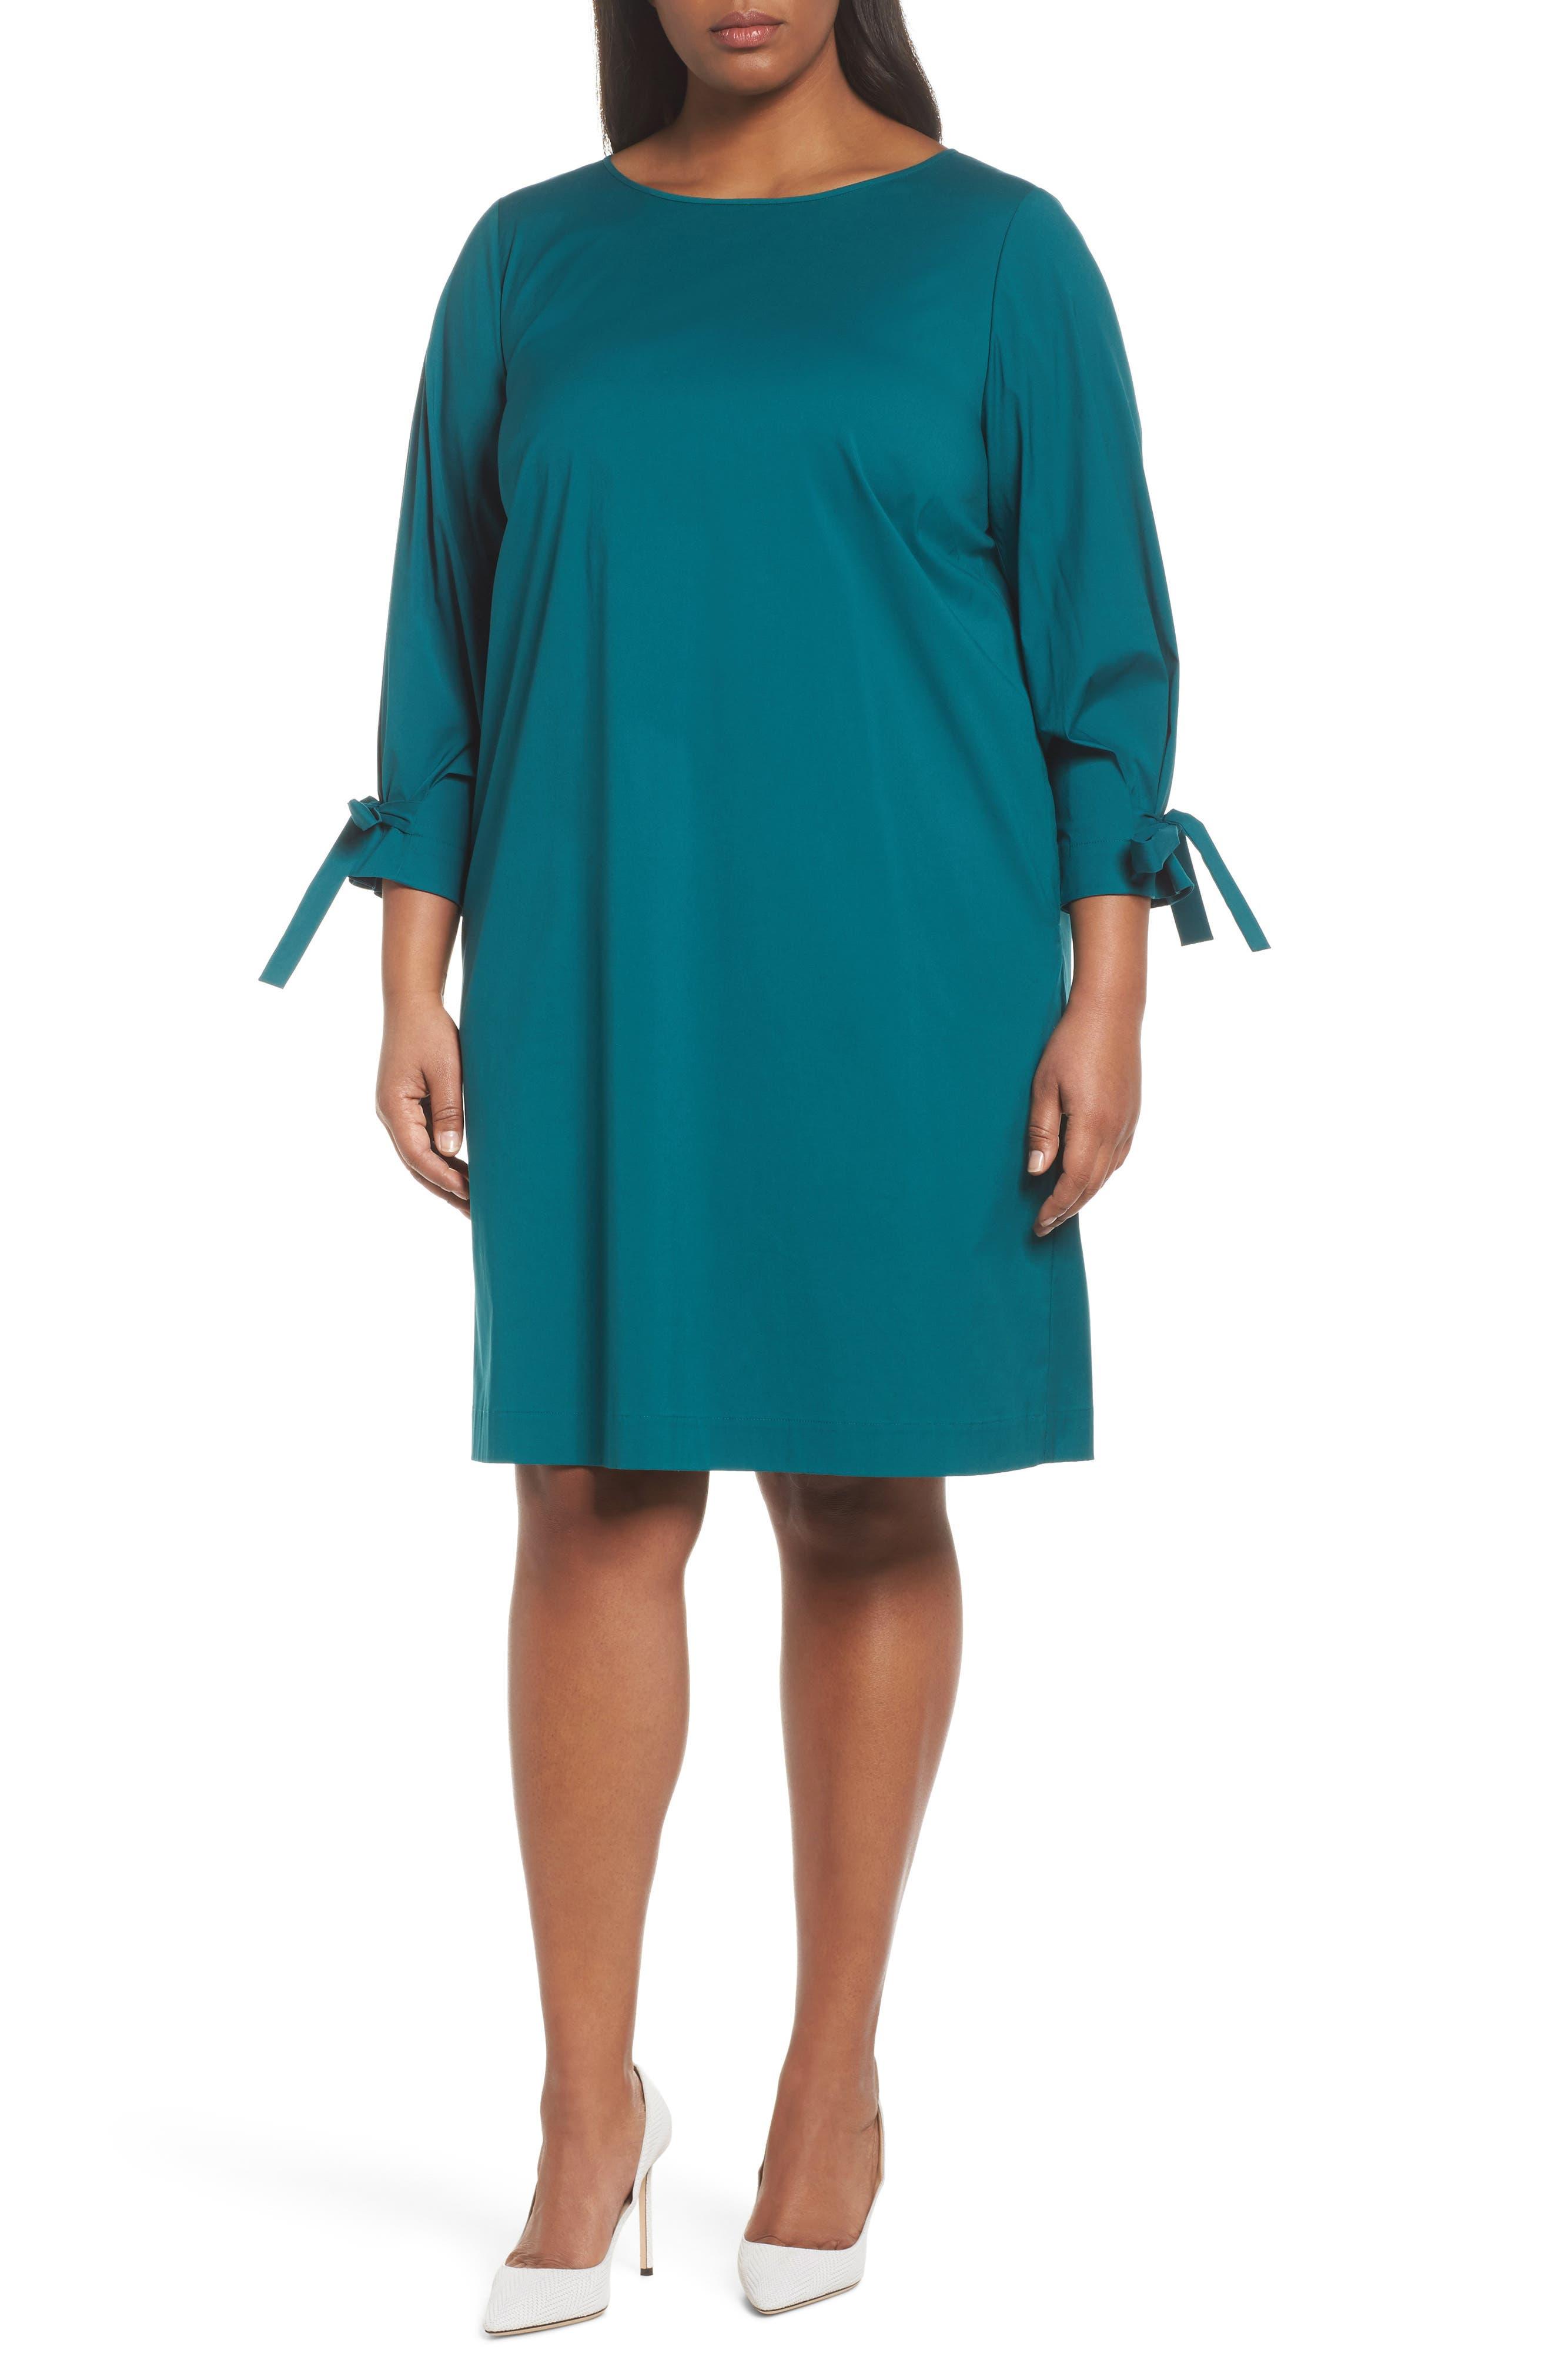 Paige Shift Dress,                             Main thumbnail 1, color,                             432